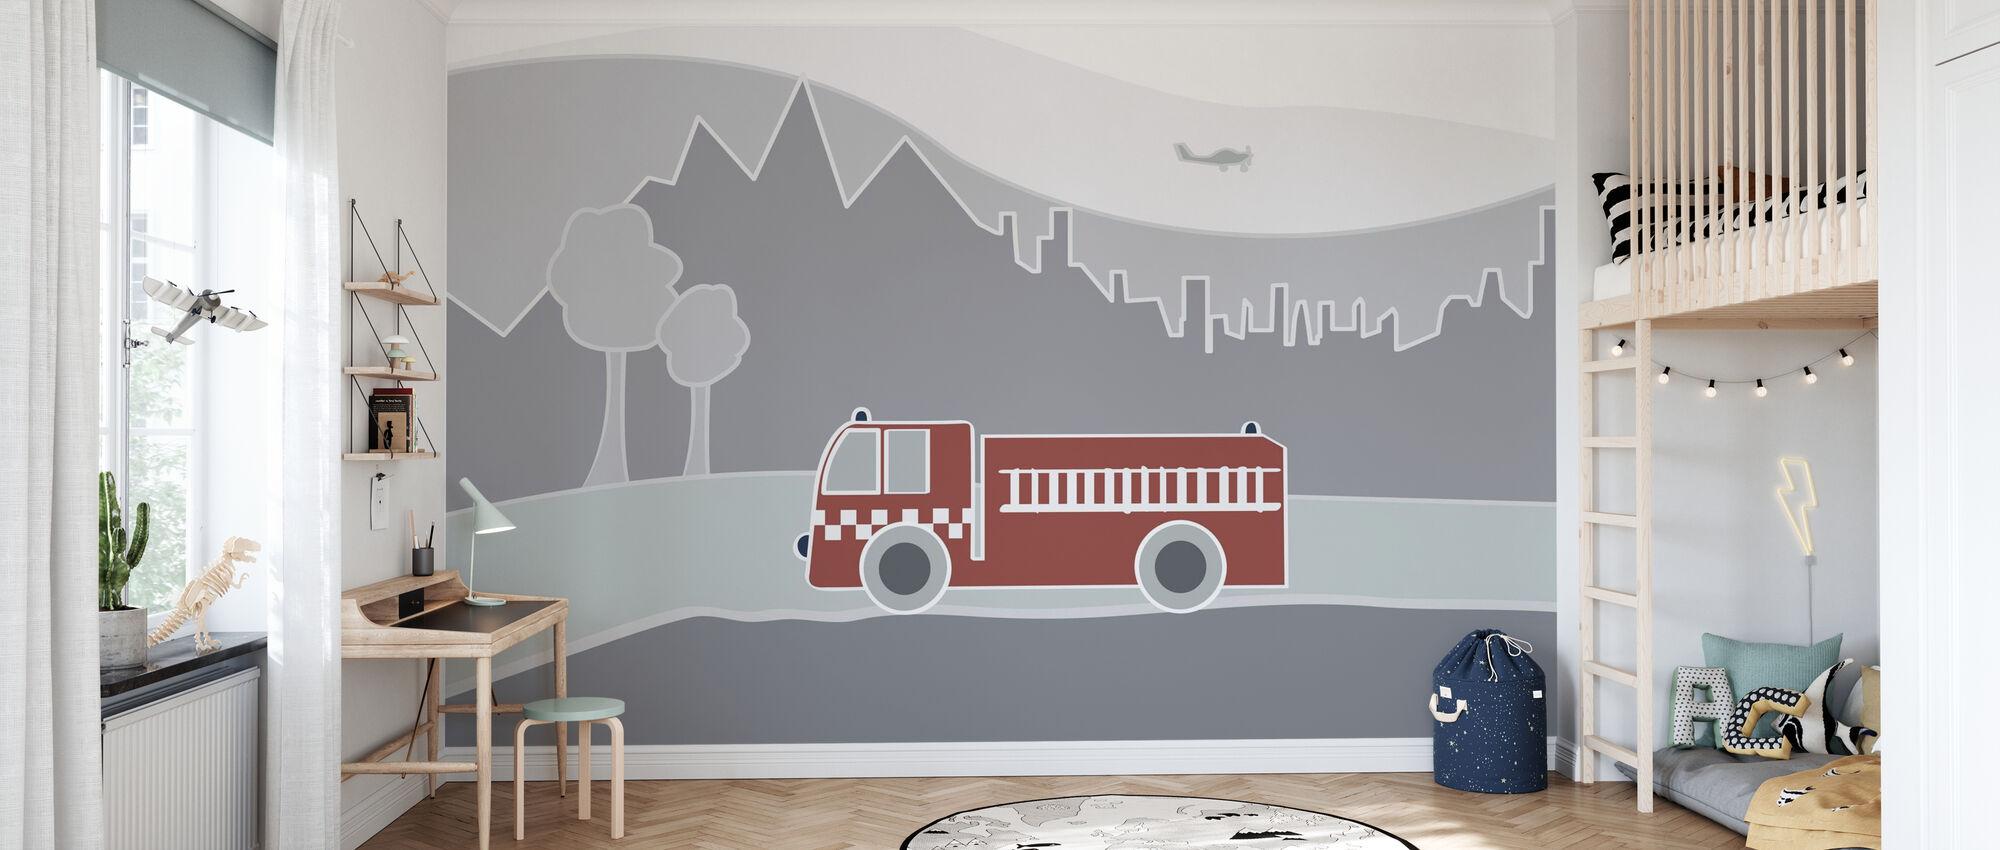 Fire Truck - Wallpaper - Kids Room